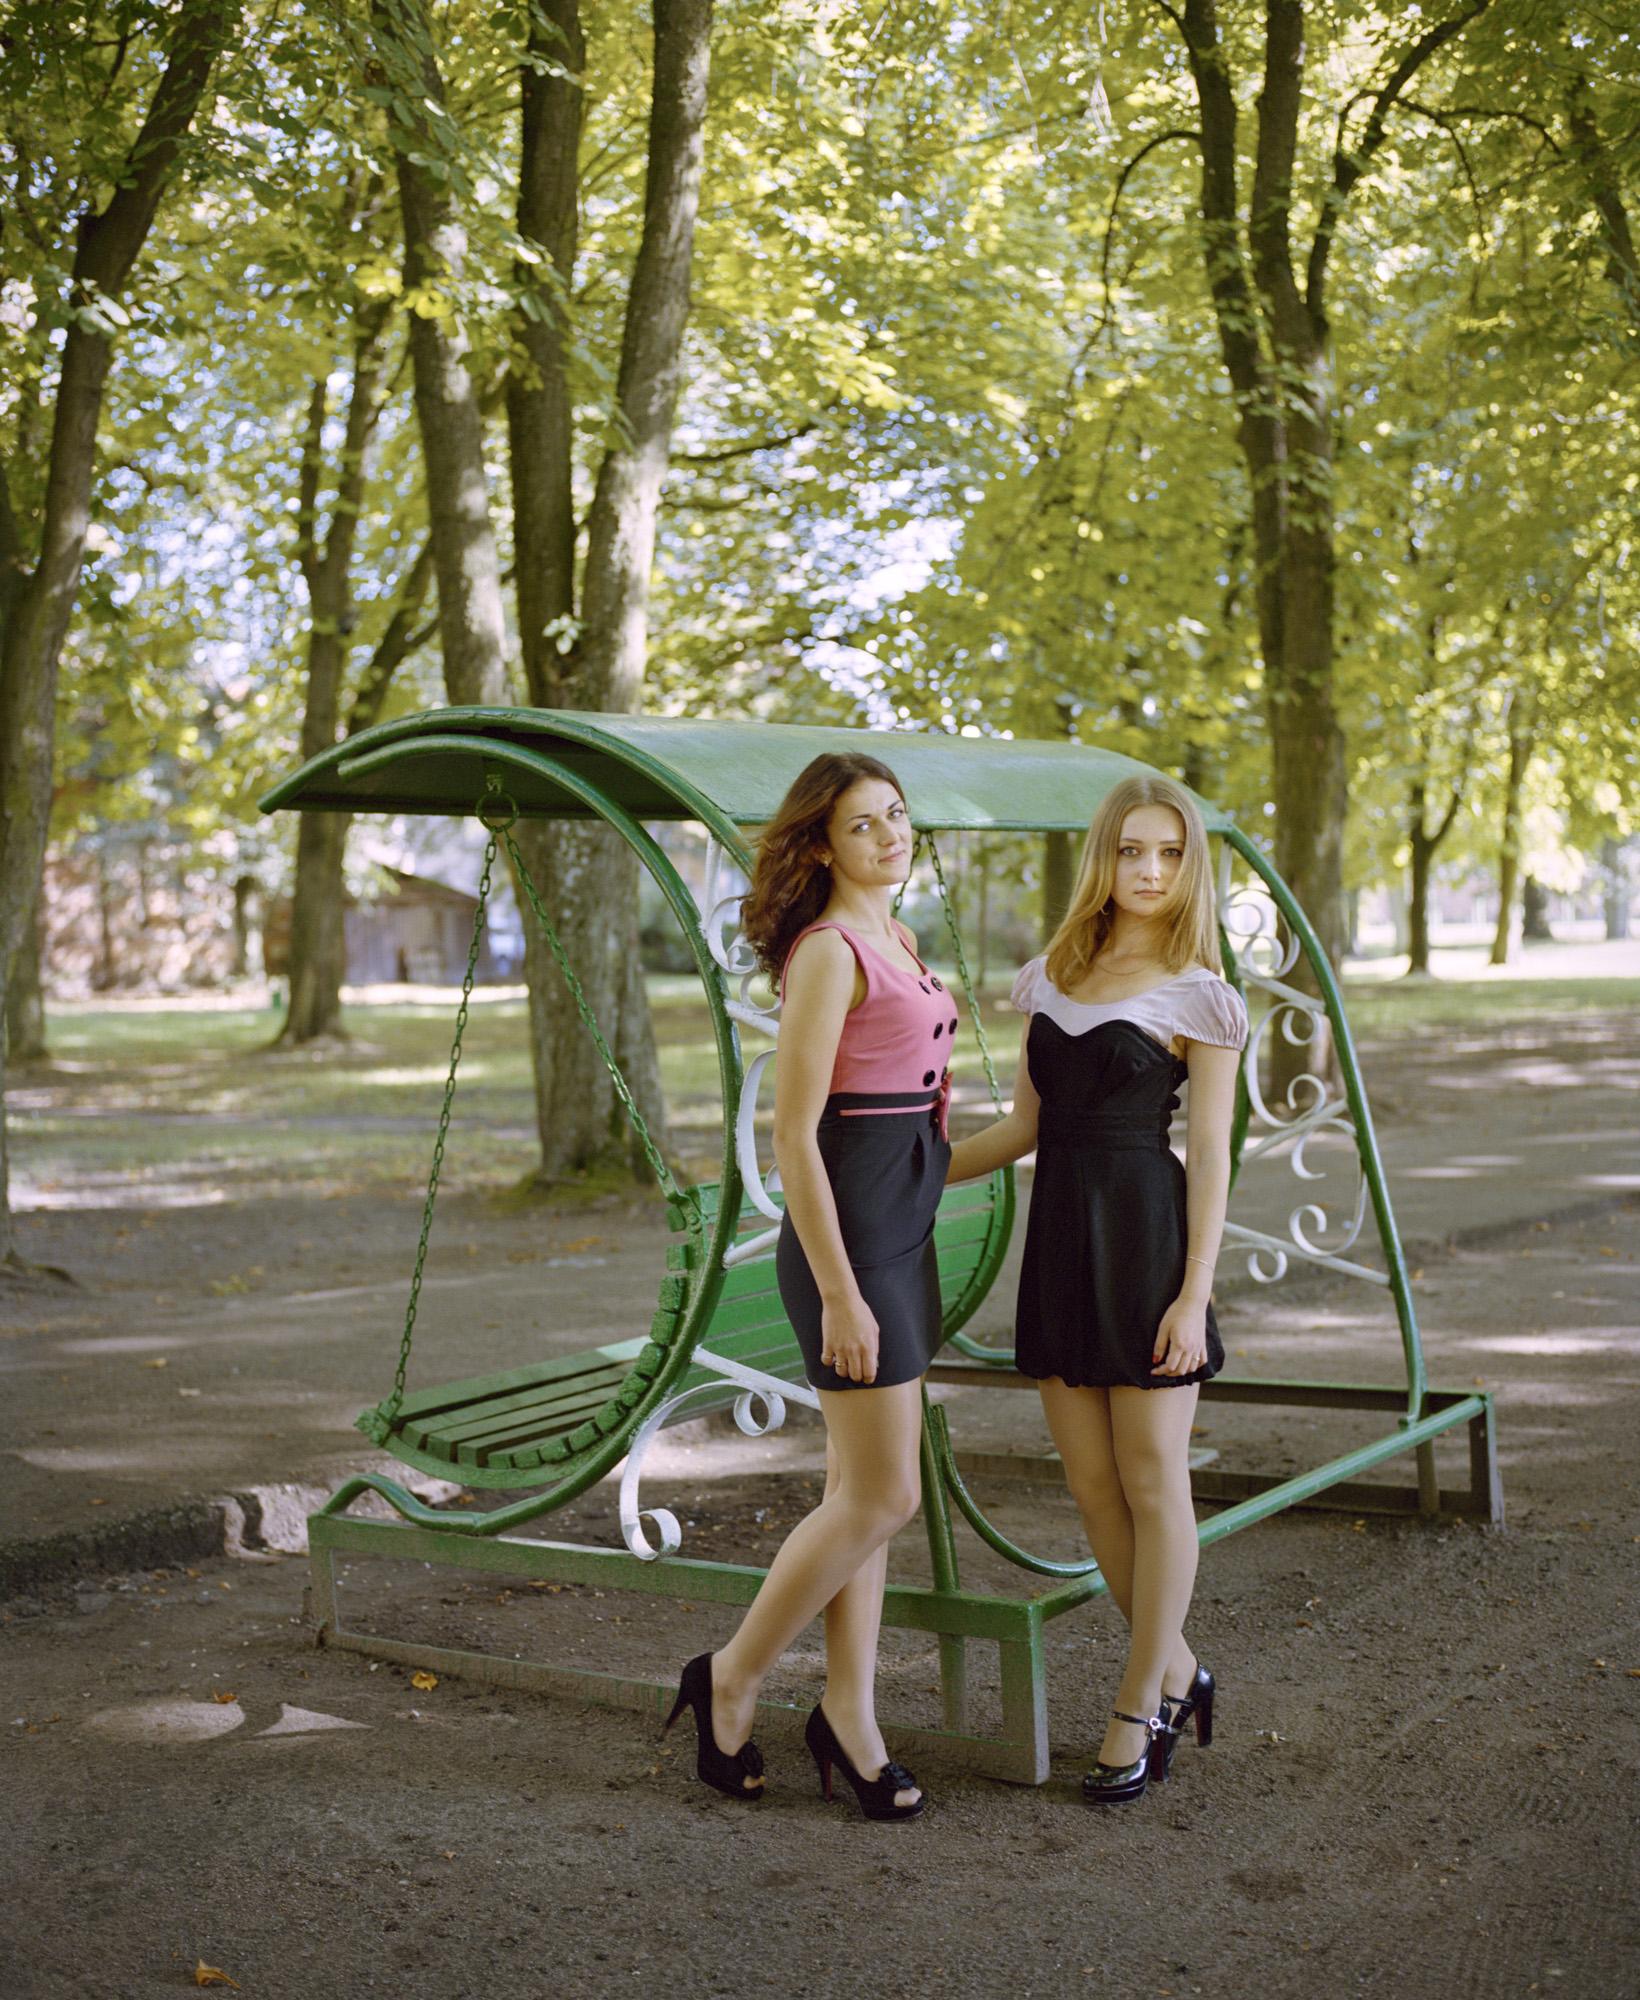 17-Nadia-and-Andzelika-city-park-Pravdinsk-Kaliningrad